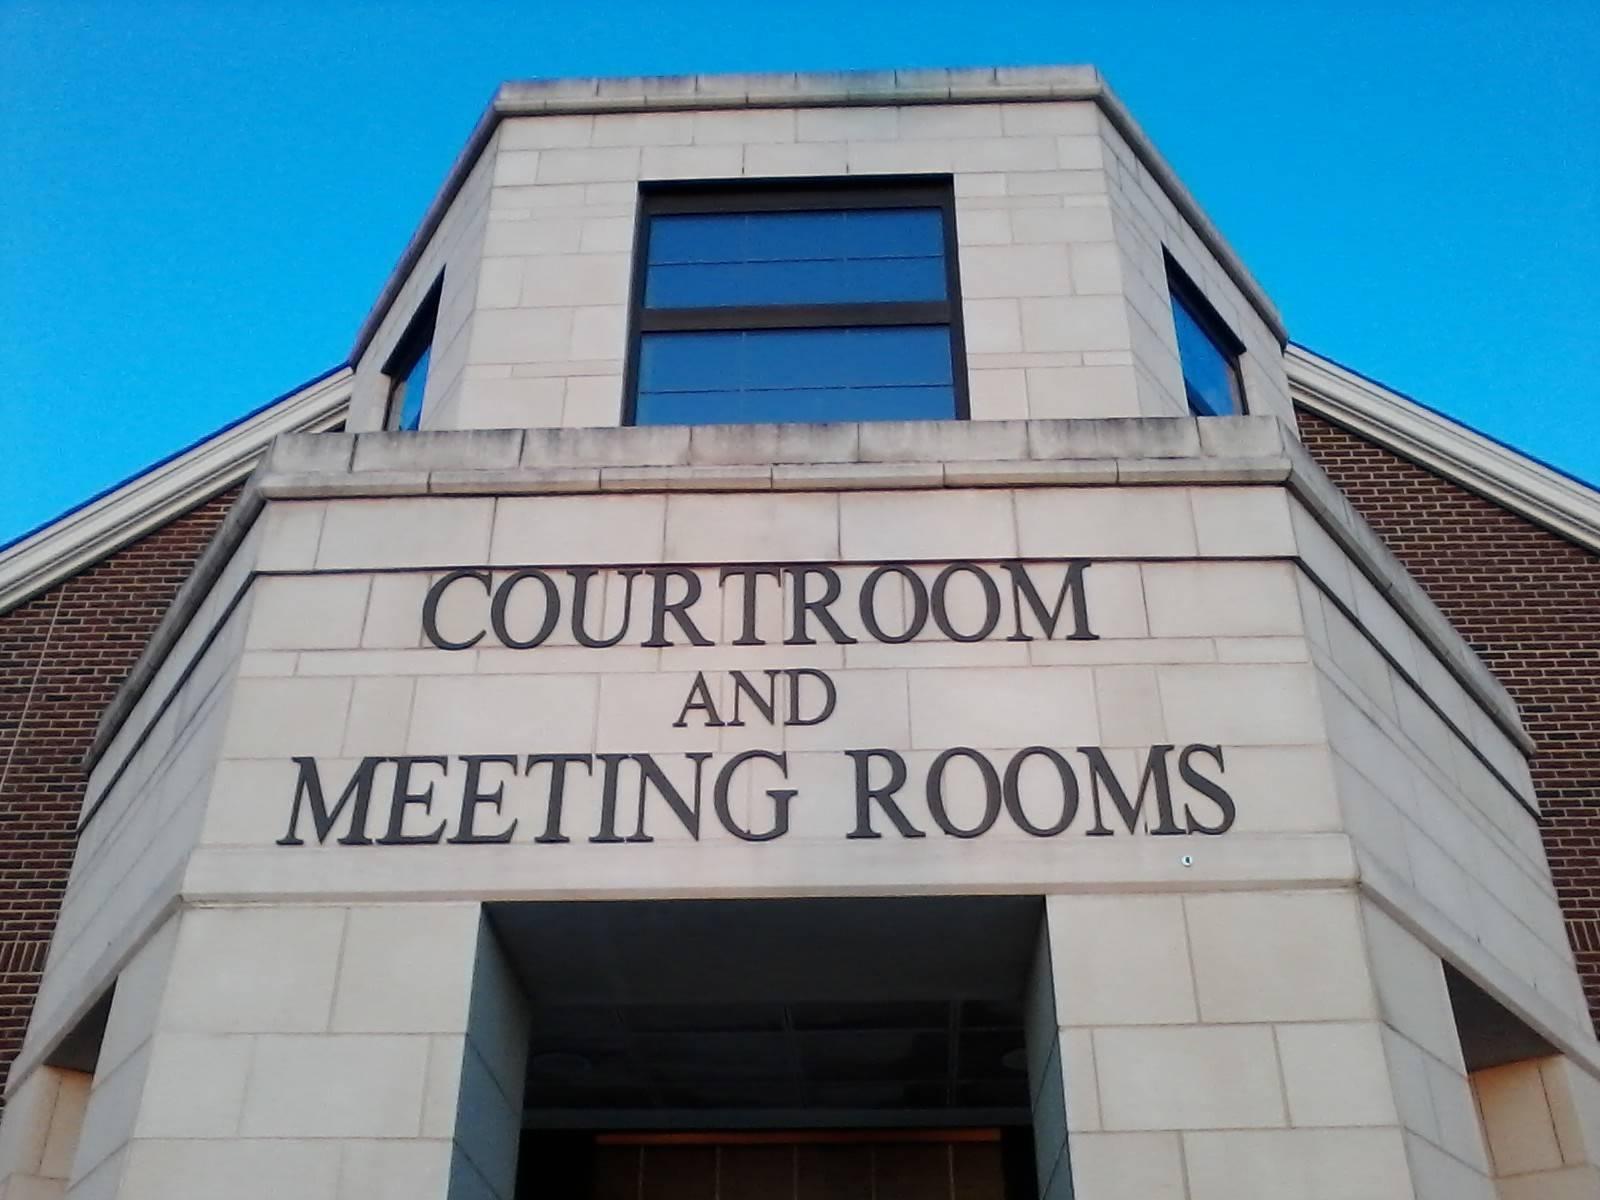 2a0cfaefc8643daa7911_bridgewater_courtroom.jpg